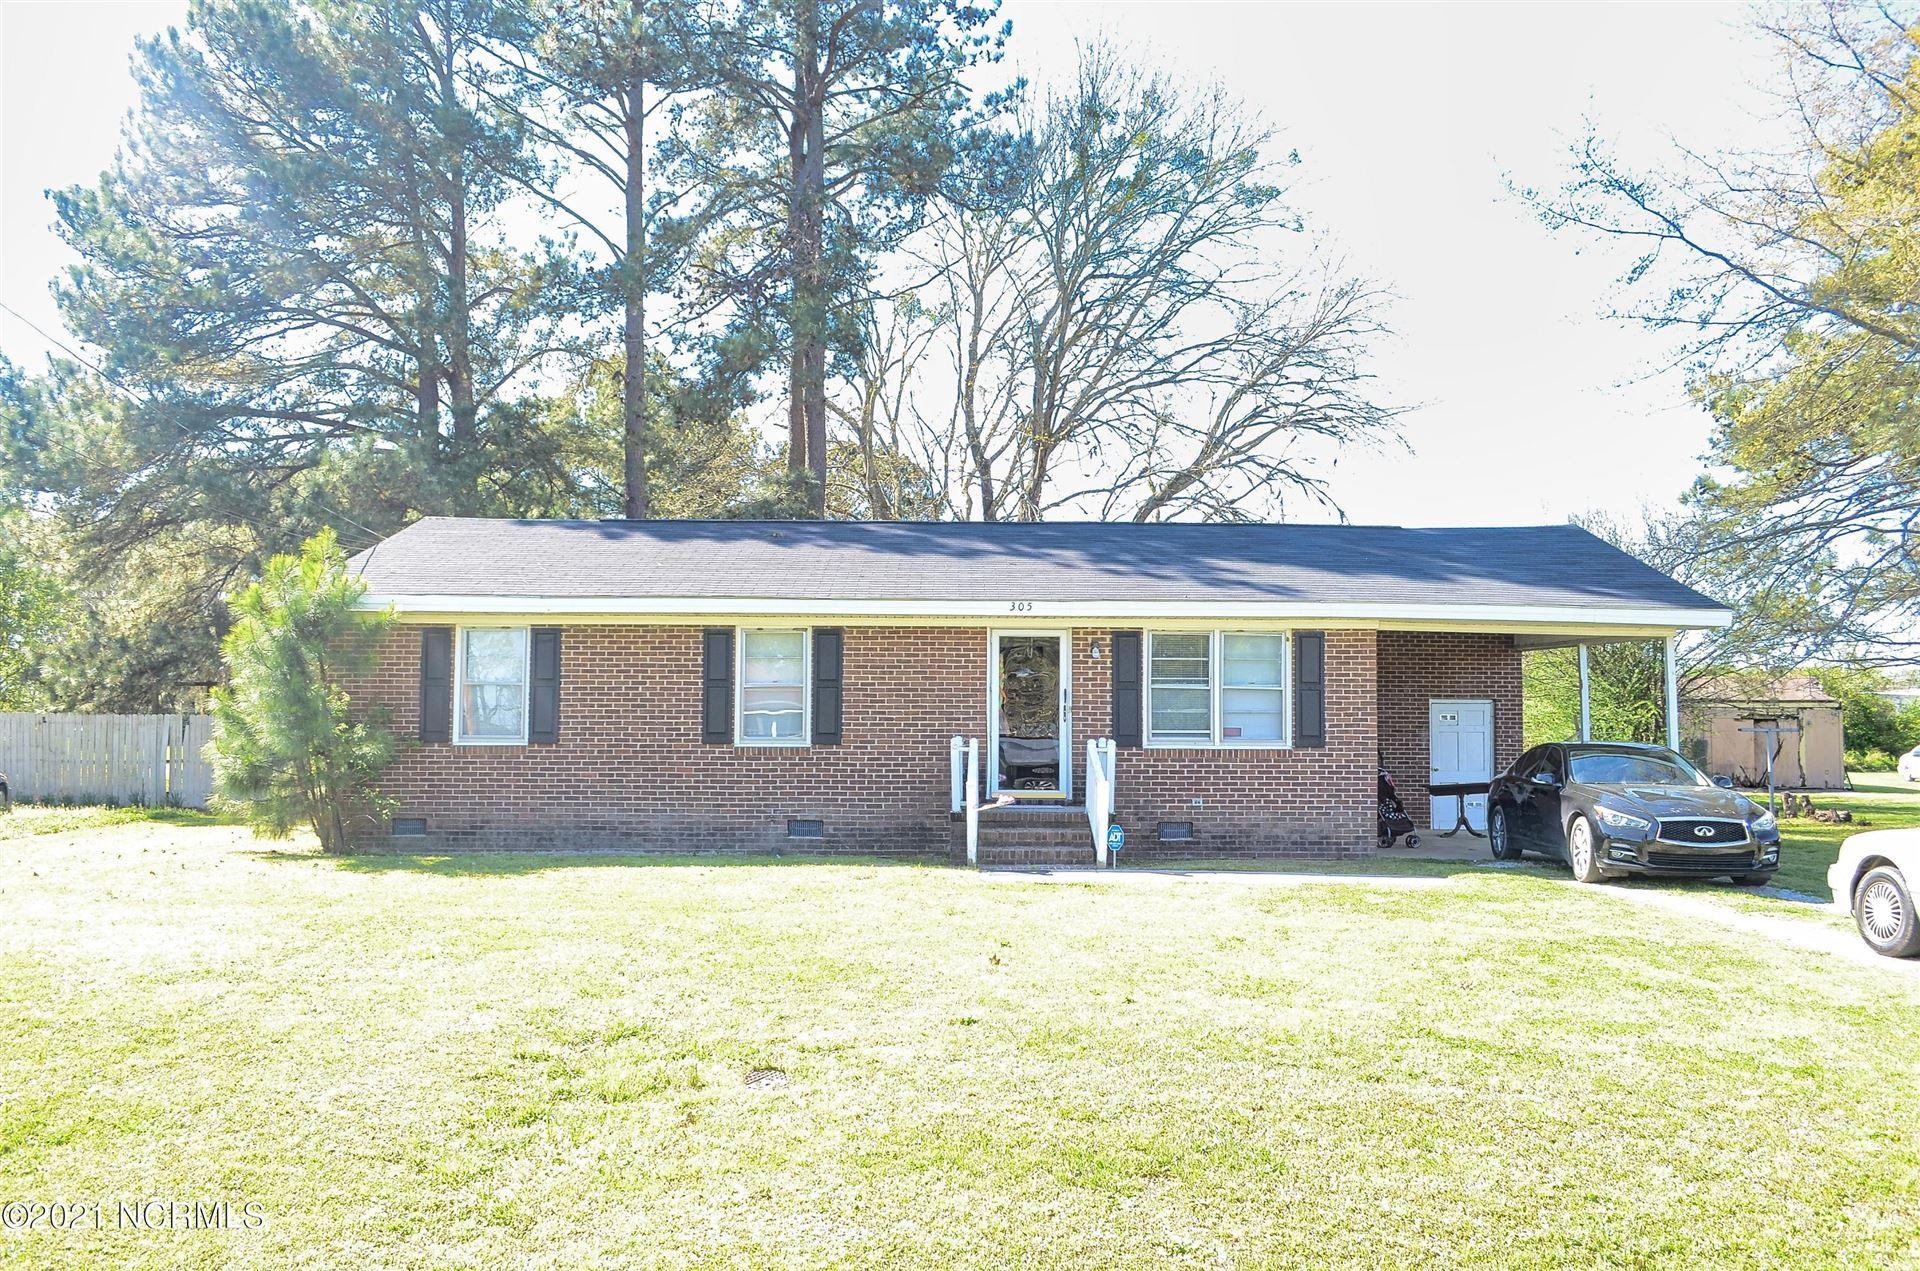 Photo of 305 Minshall Drive, Stantonsburg, NC 27883 (MLS # 100264739)